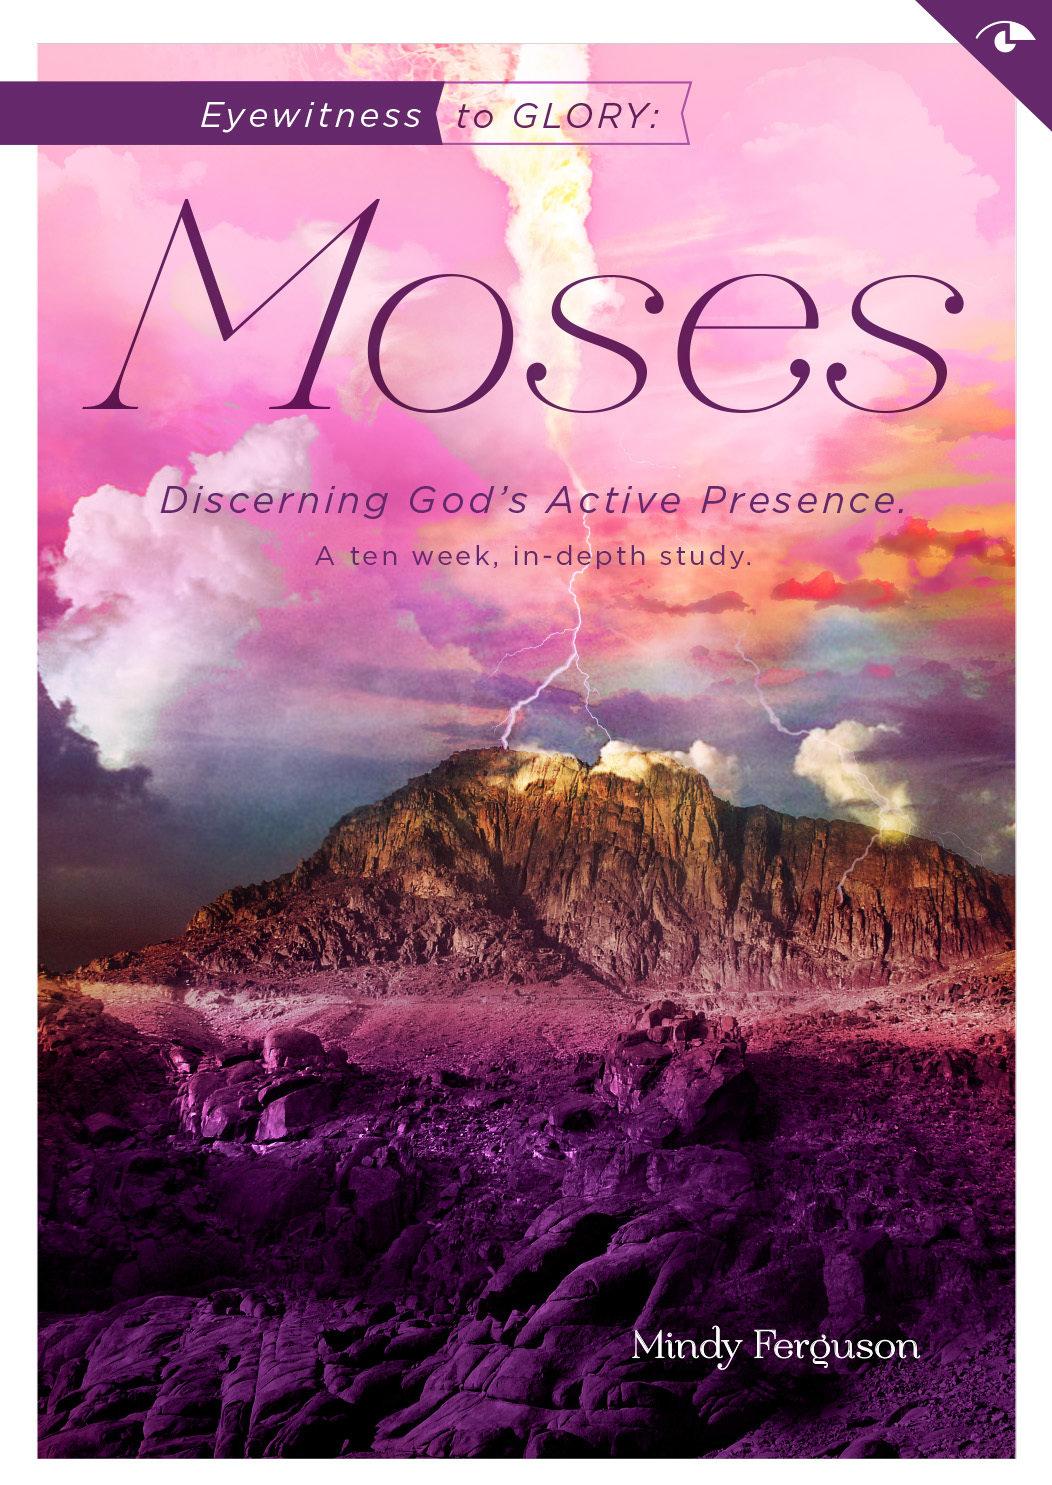 Moses: Eyewitness to Glory Video Series